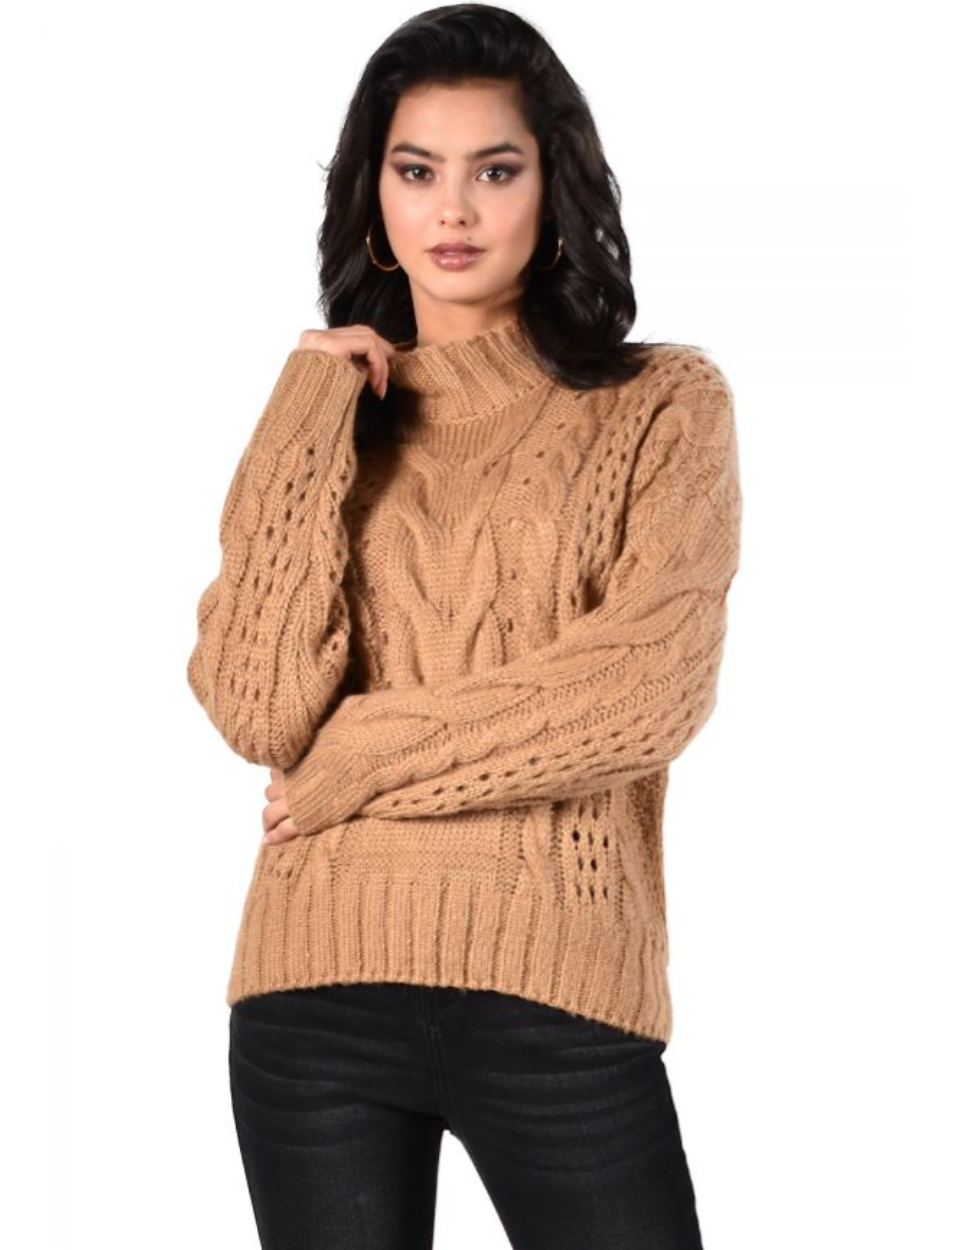 Frank Camel Knit Sweater